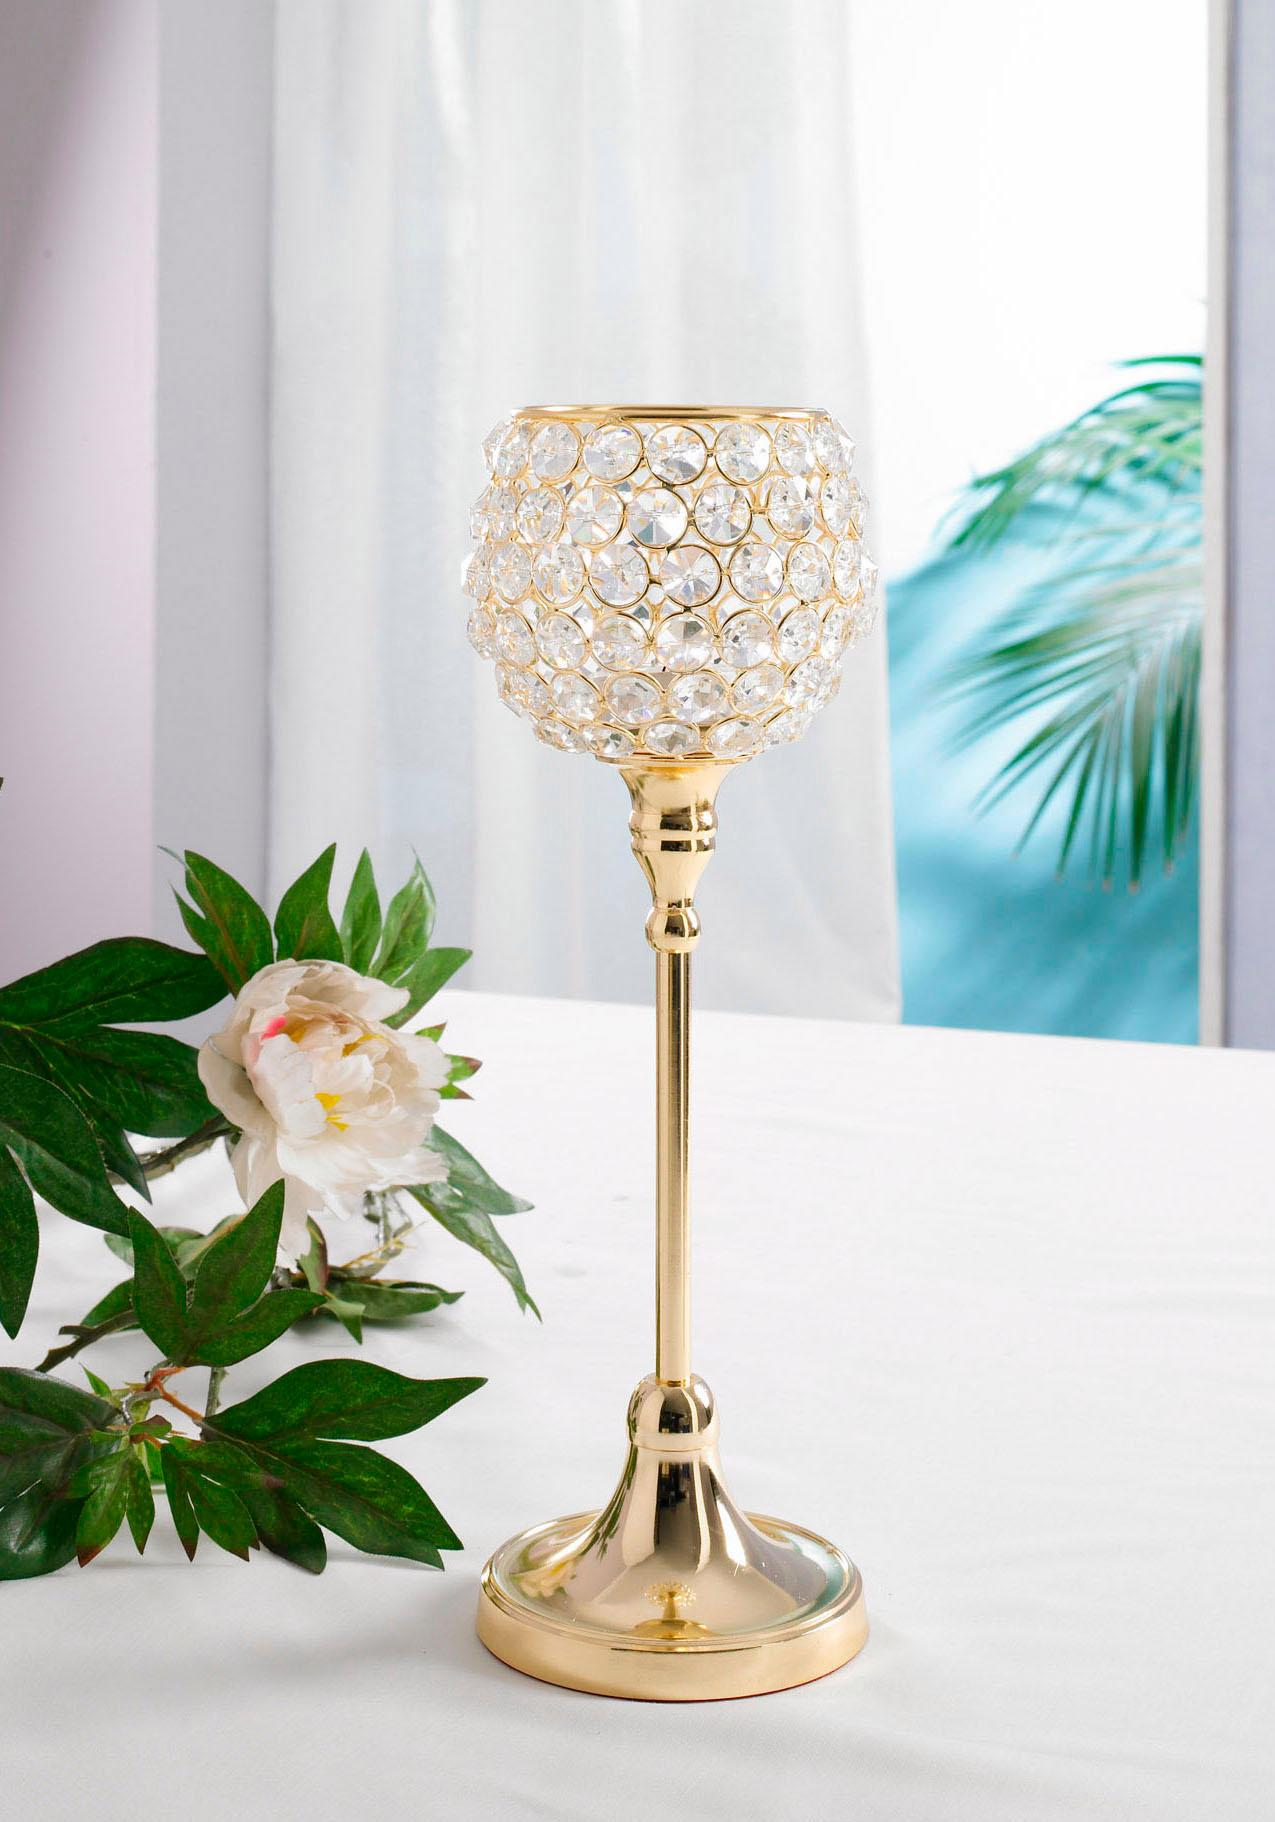 Home affaire Kerzenständer Kristall goldfarben Kerzenhalter Kerzen Laternen Wohnaccessoires